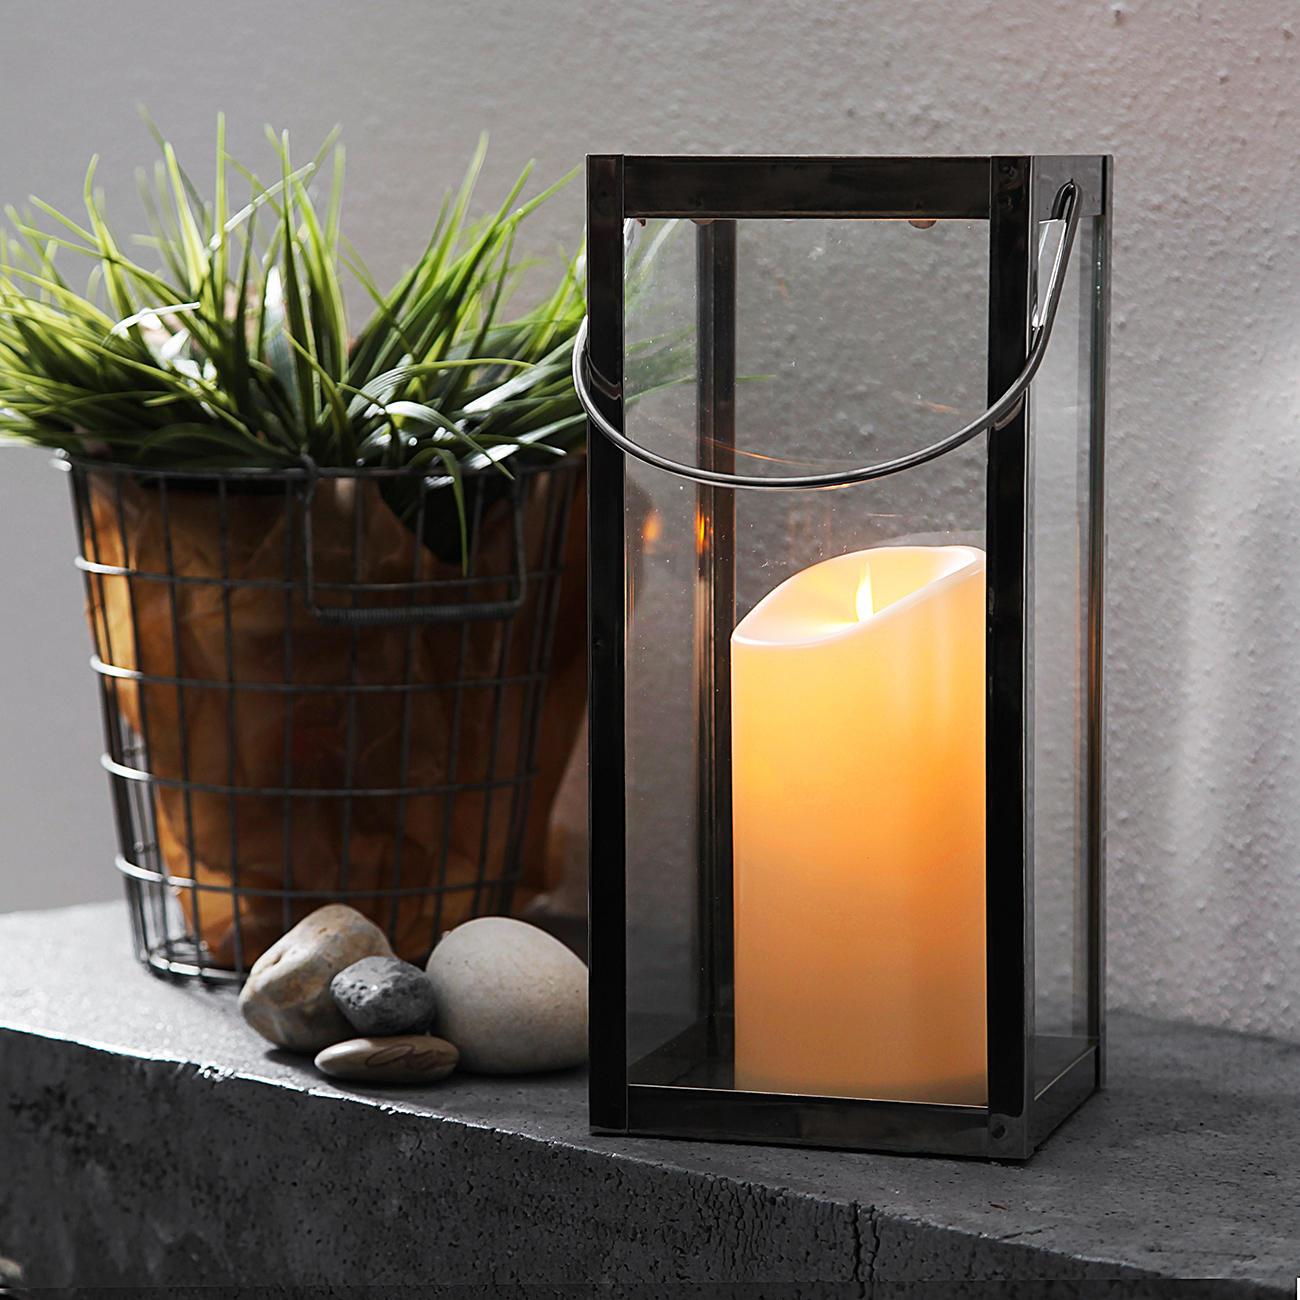 twinkle led outdoor kerze 3 jahre garantie pro idee. Black Bedroom Furniture Sets. Home Design Ideas